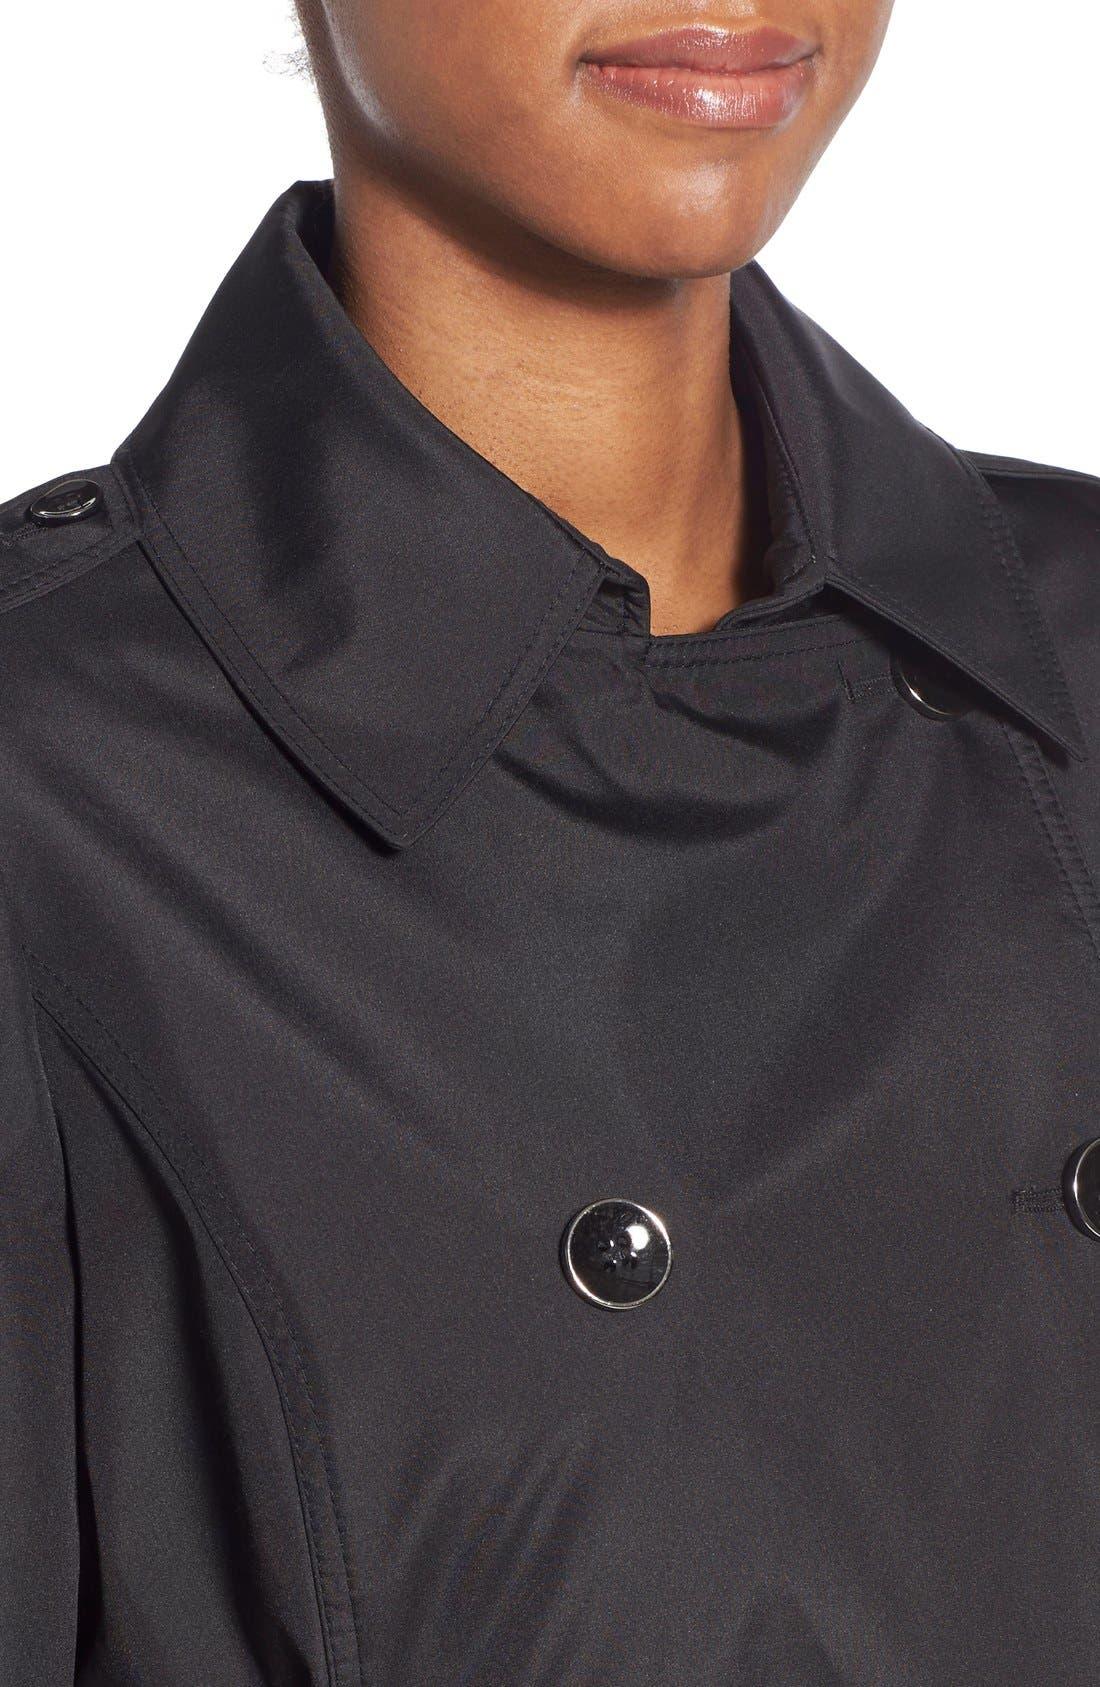 Faux Leather Trim Trench Coat,                             Alternate thumbnail 4, color,                             001